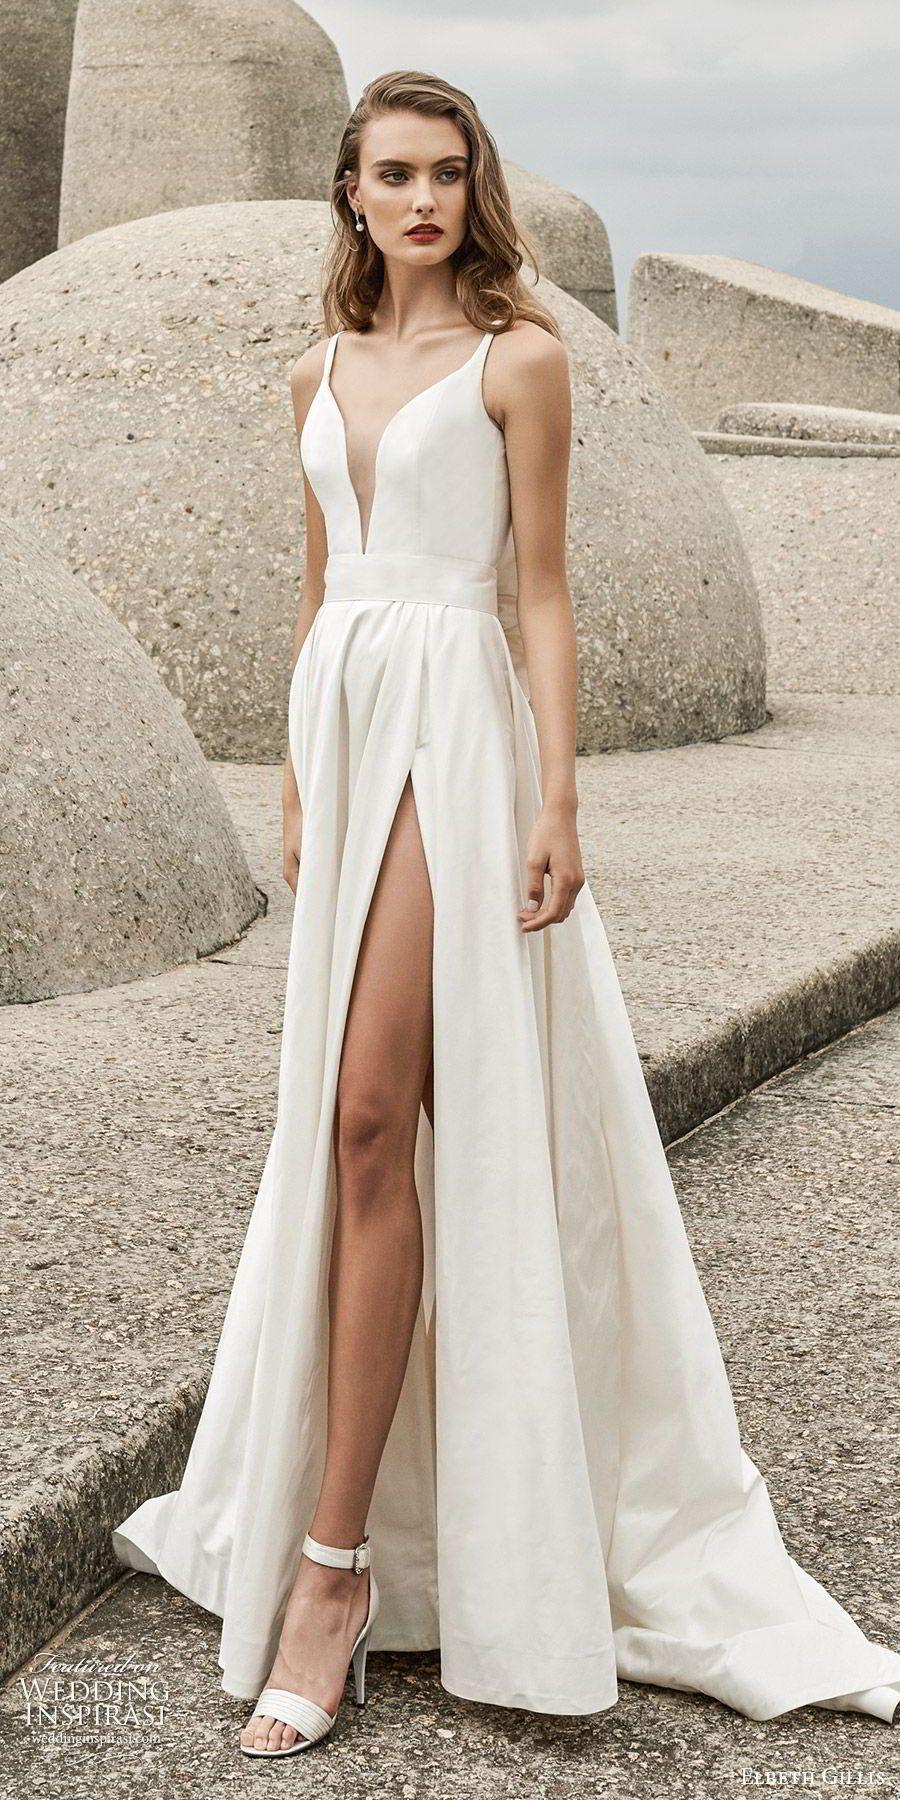 Elbeth Gillis 2020 Wedding Dresses Desire Bridal Collection Wedding Inspirasi Minimal Wedding Dress Wedding Dresses Lace Wedding Dress Trends